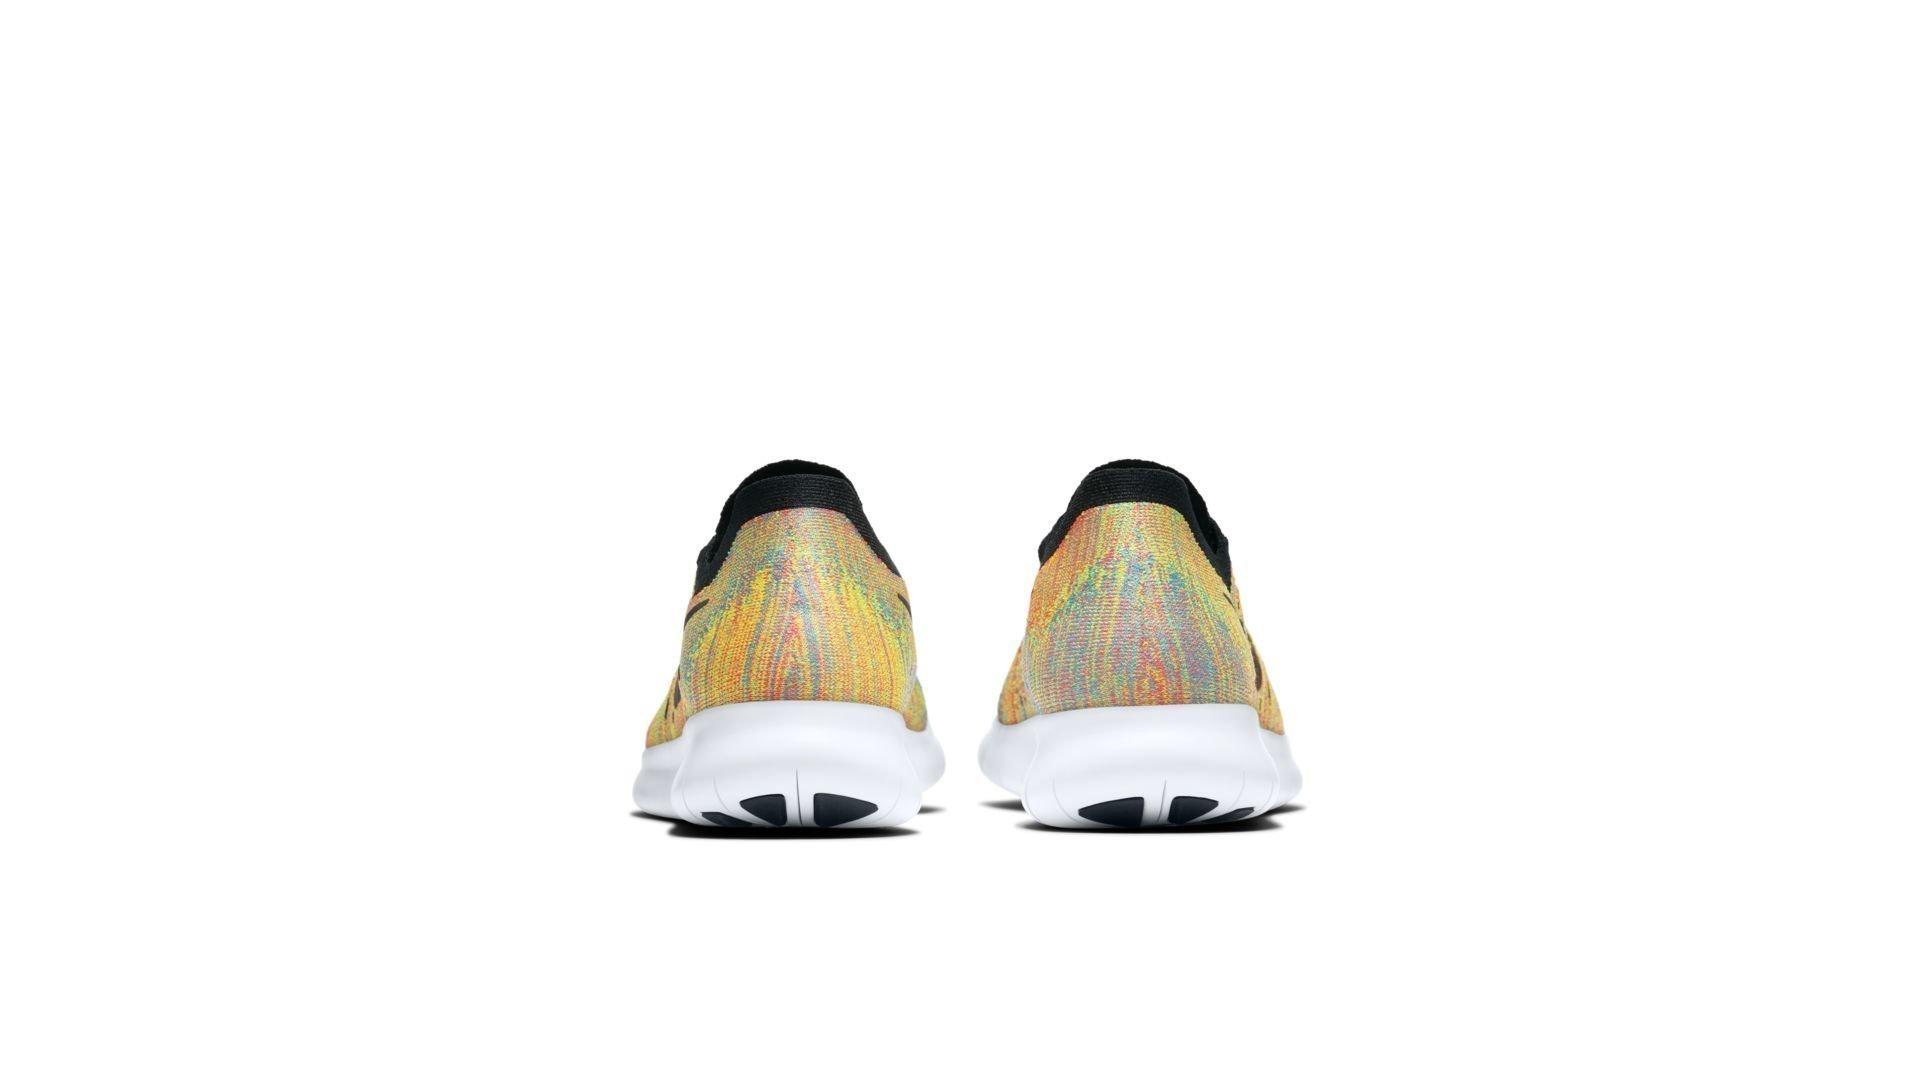 Nike Free RN Flyknit 2017 Multi-Color (880843-005)